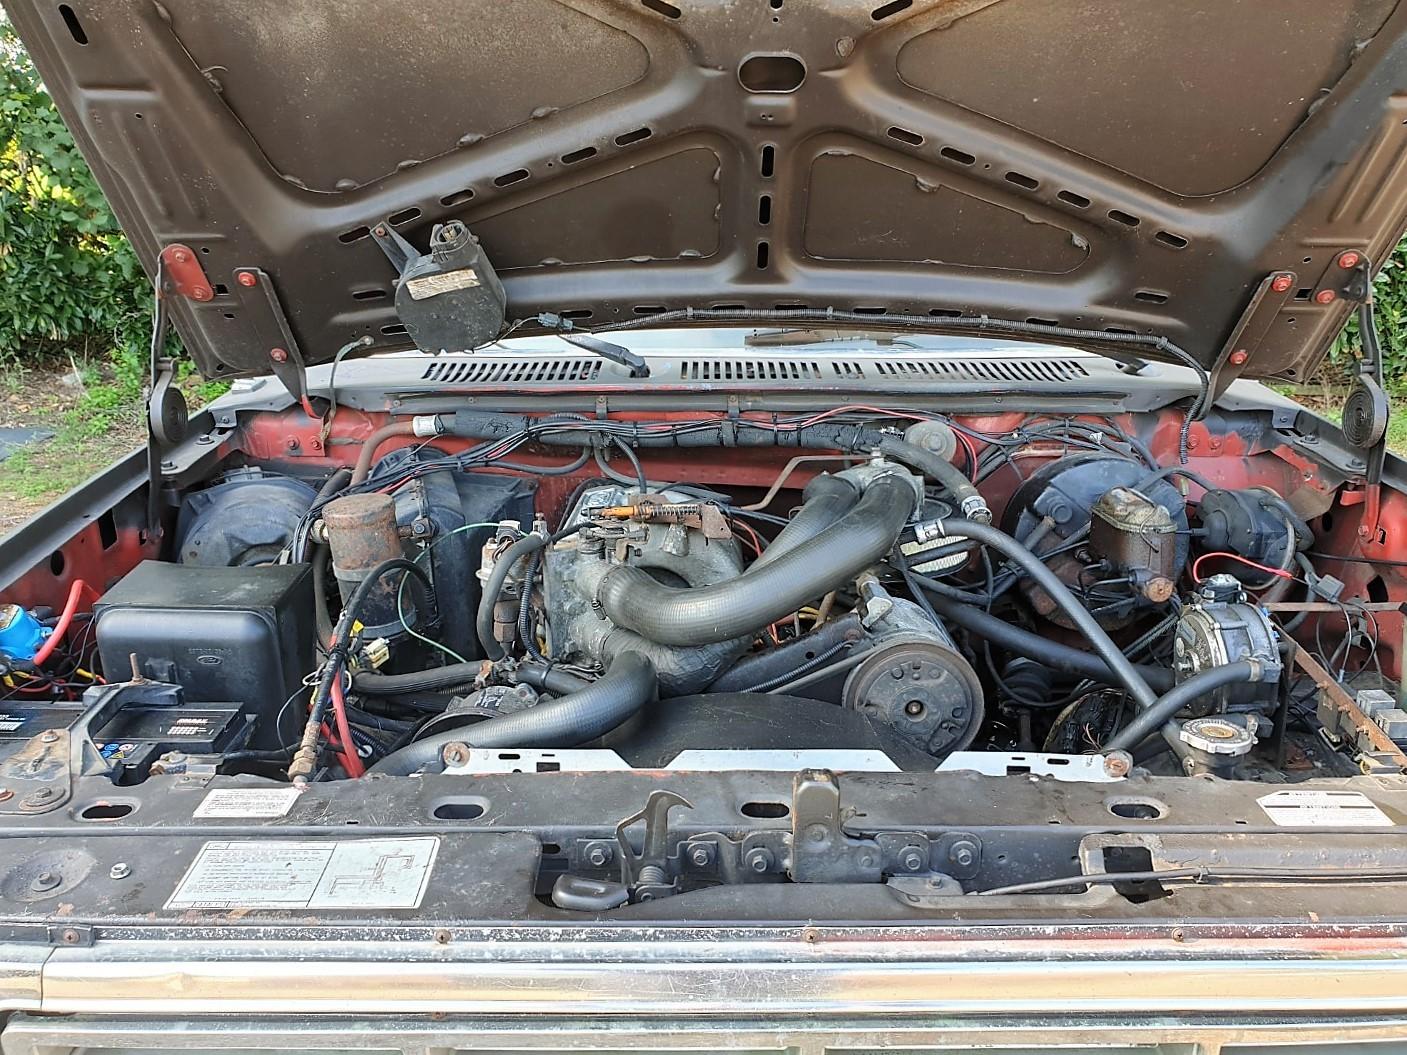 1986-Ford-F150-5L-V8-4-speed-14